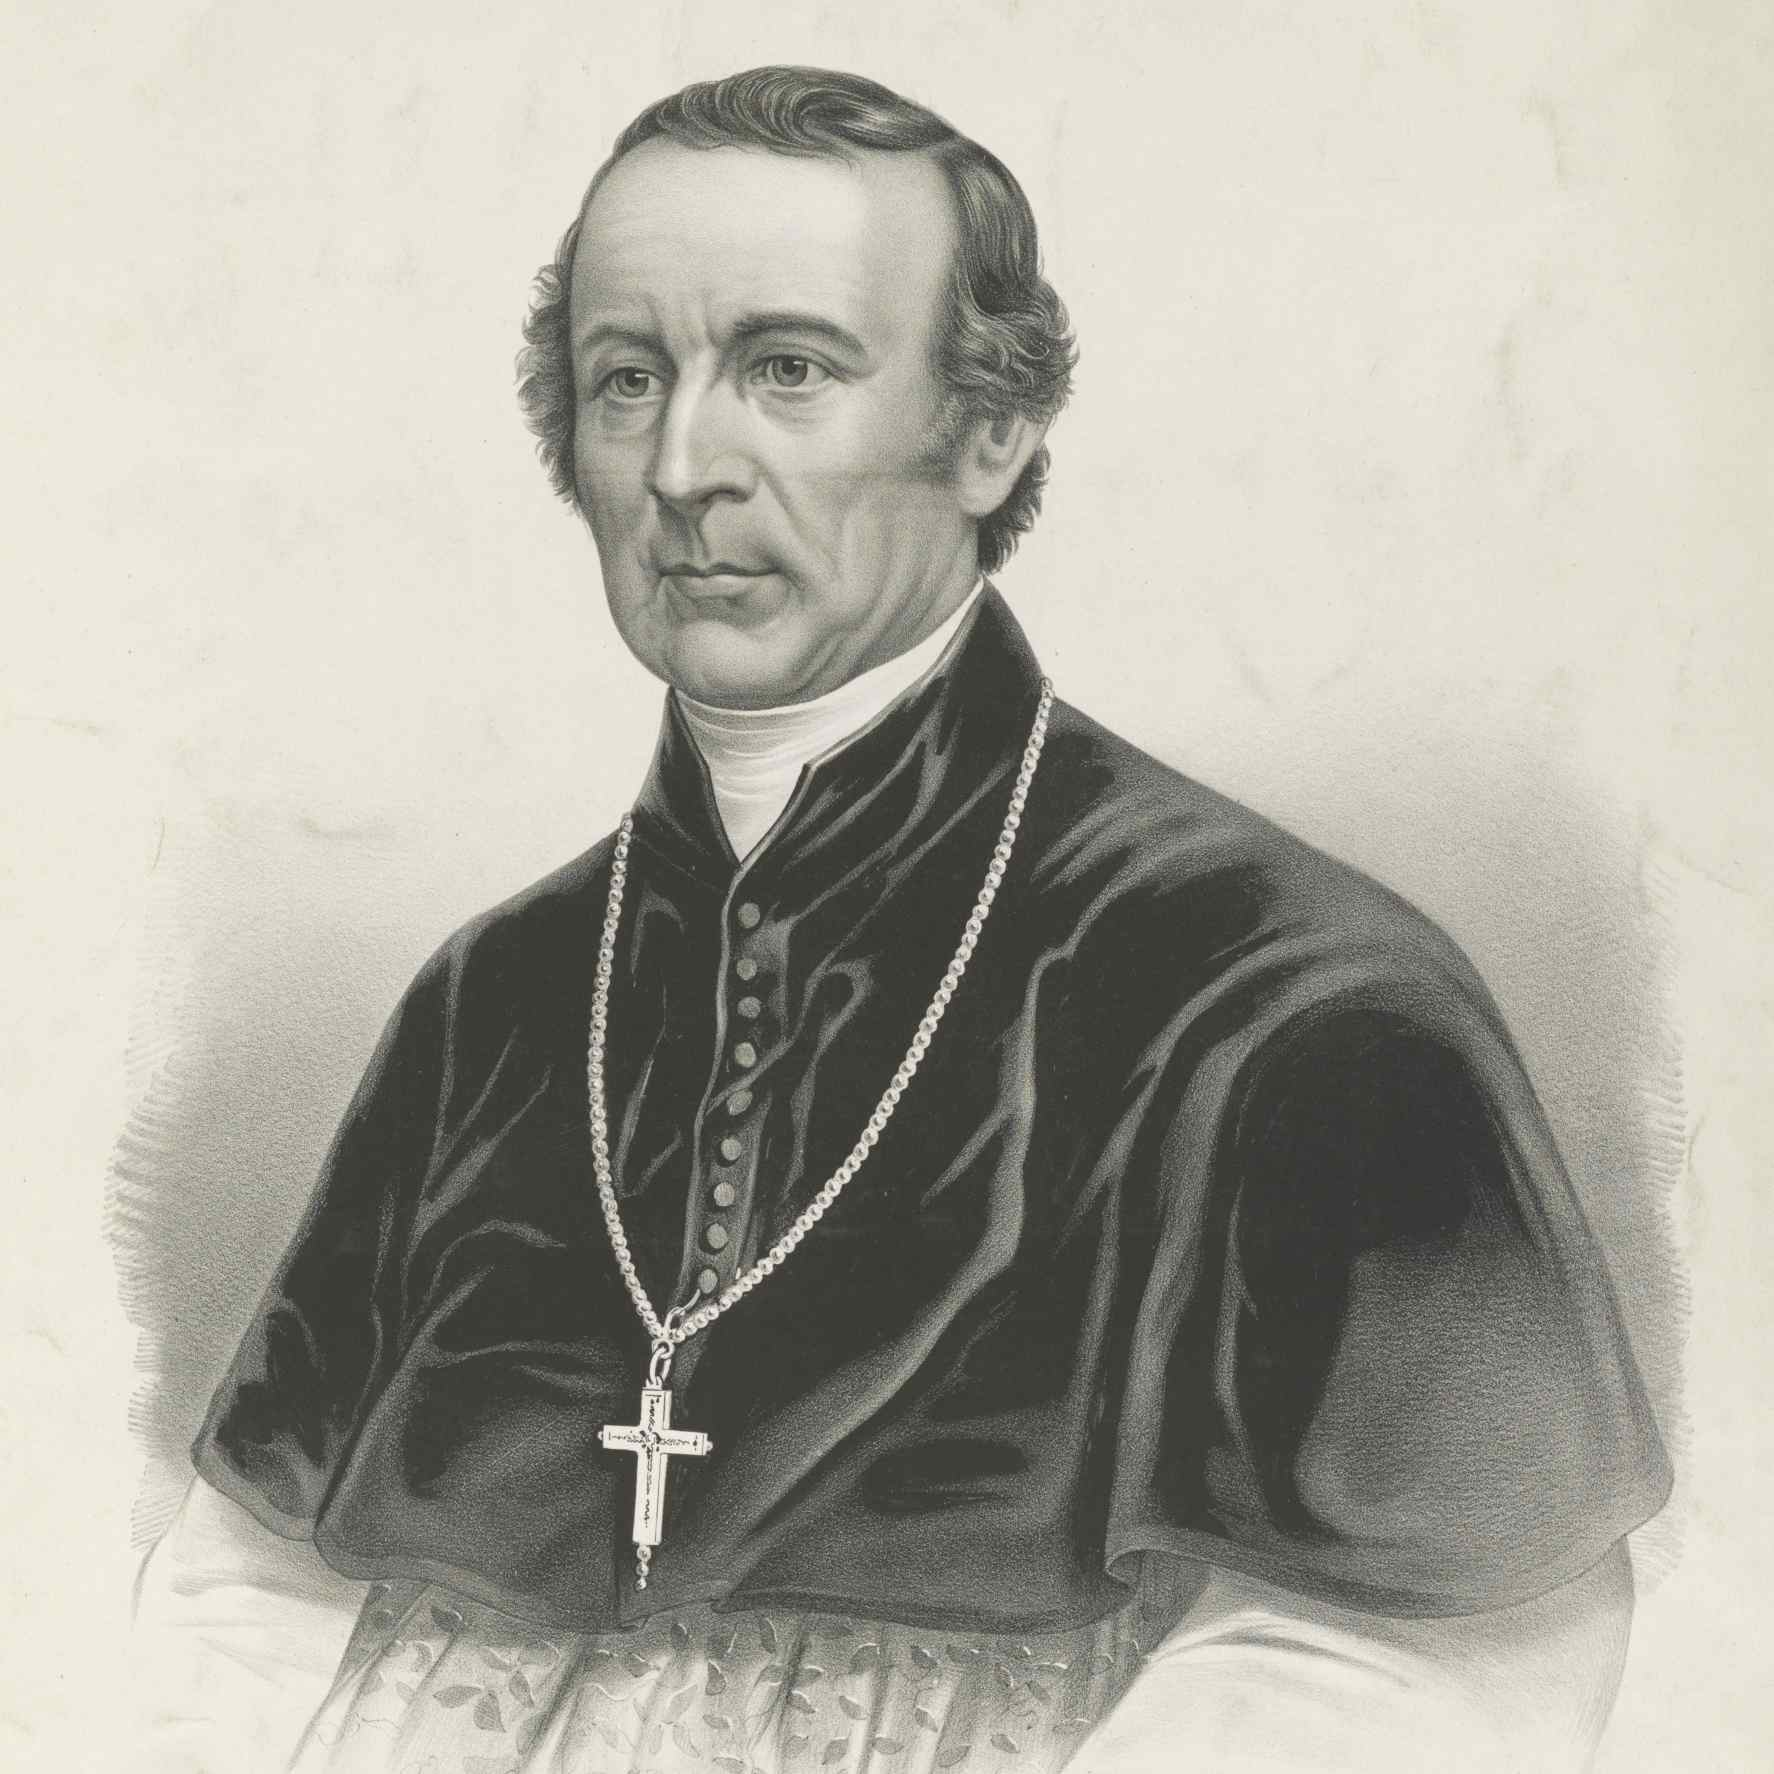 Lithographic portrait of Archbishop John Hughes